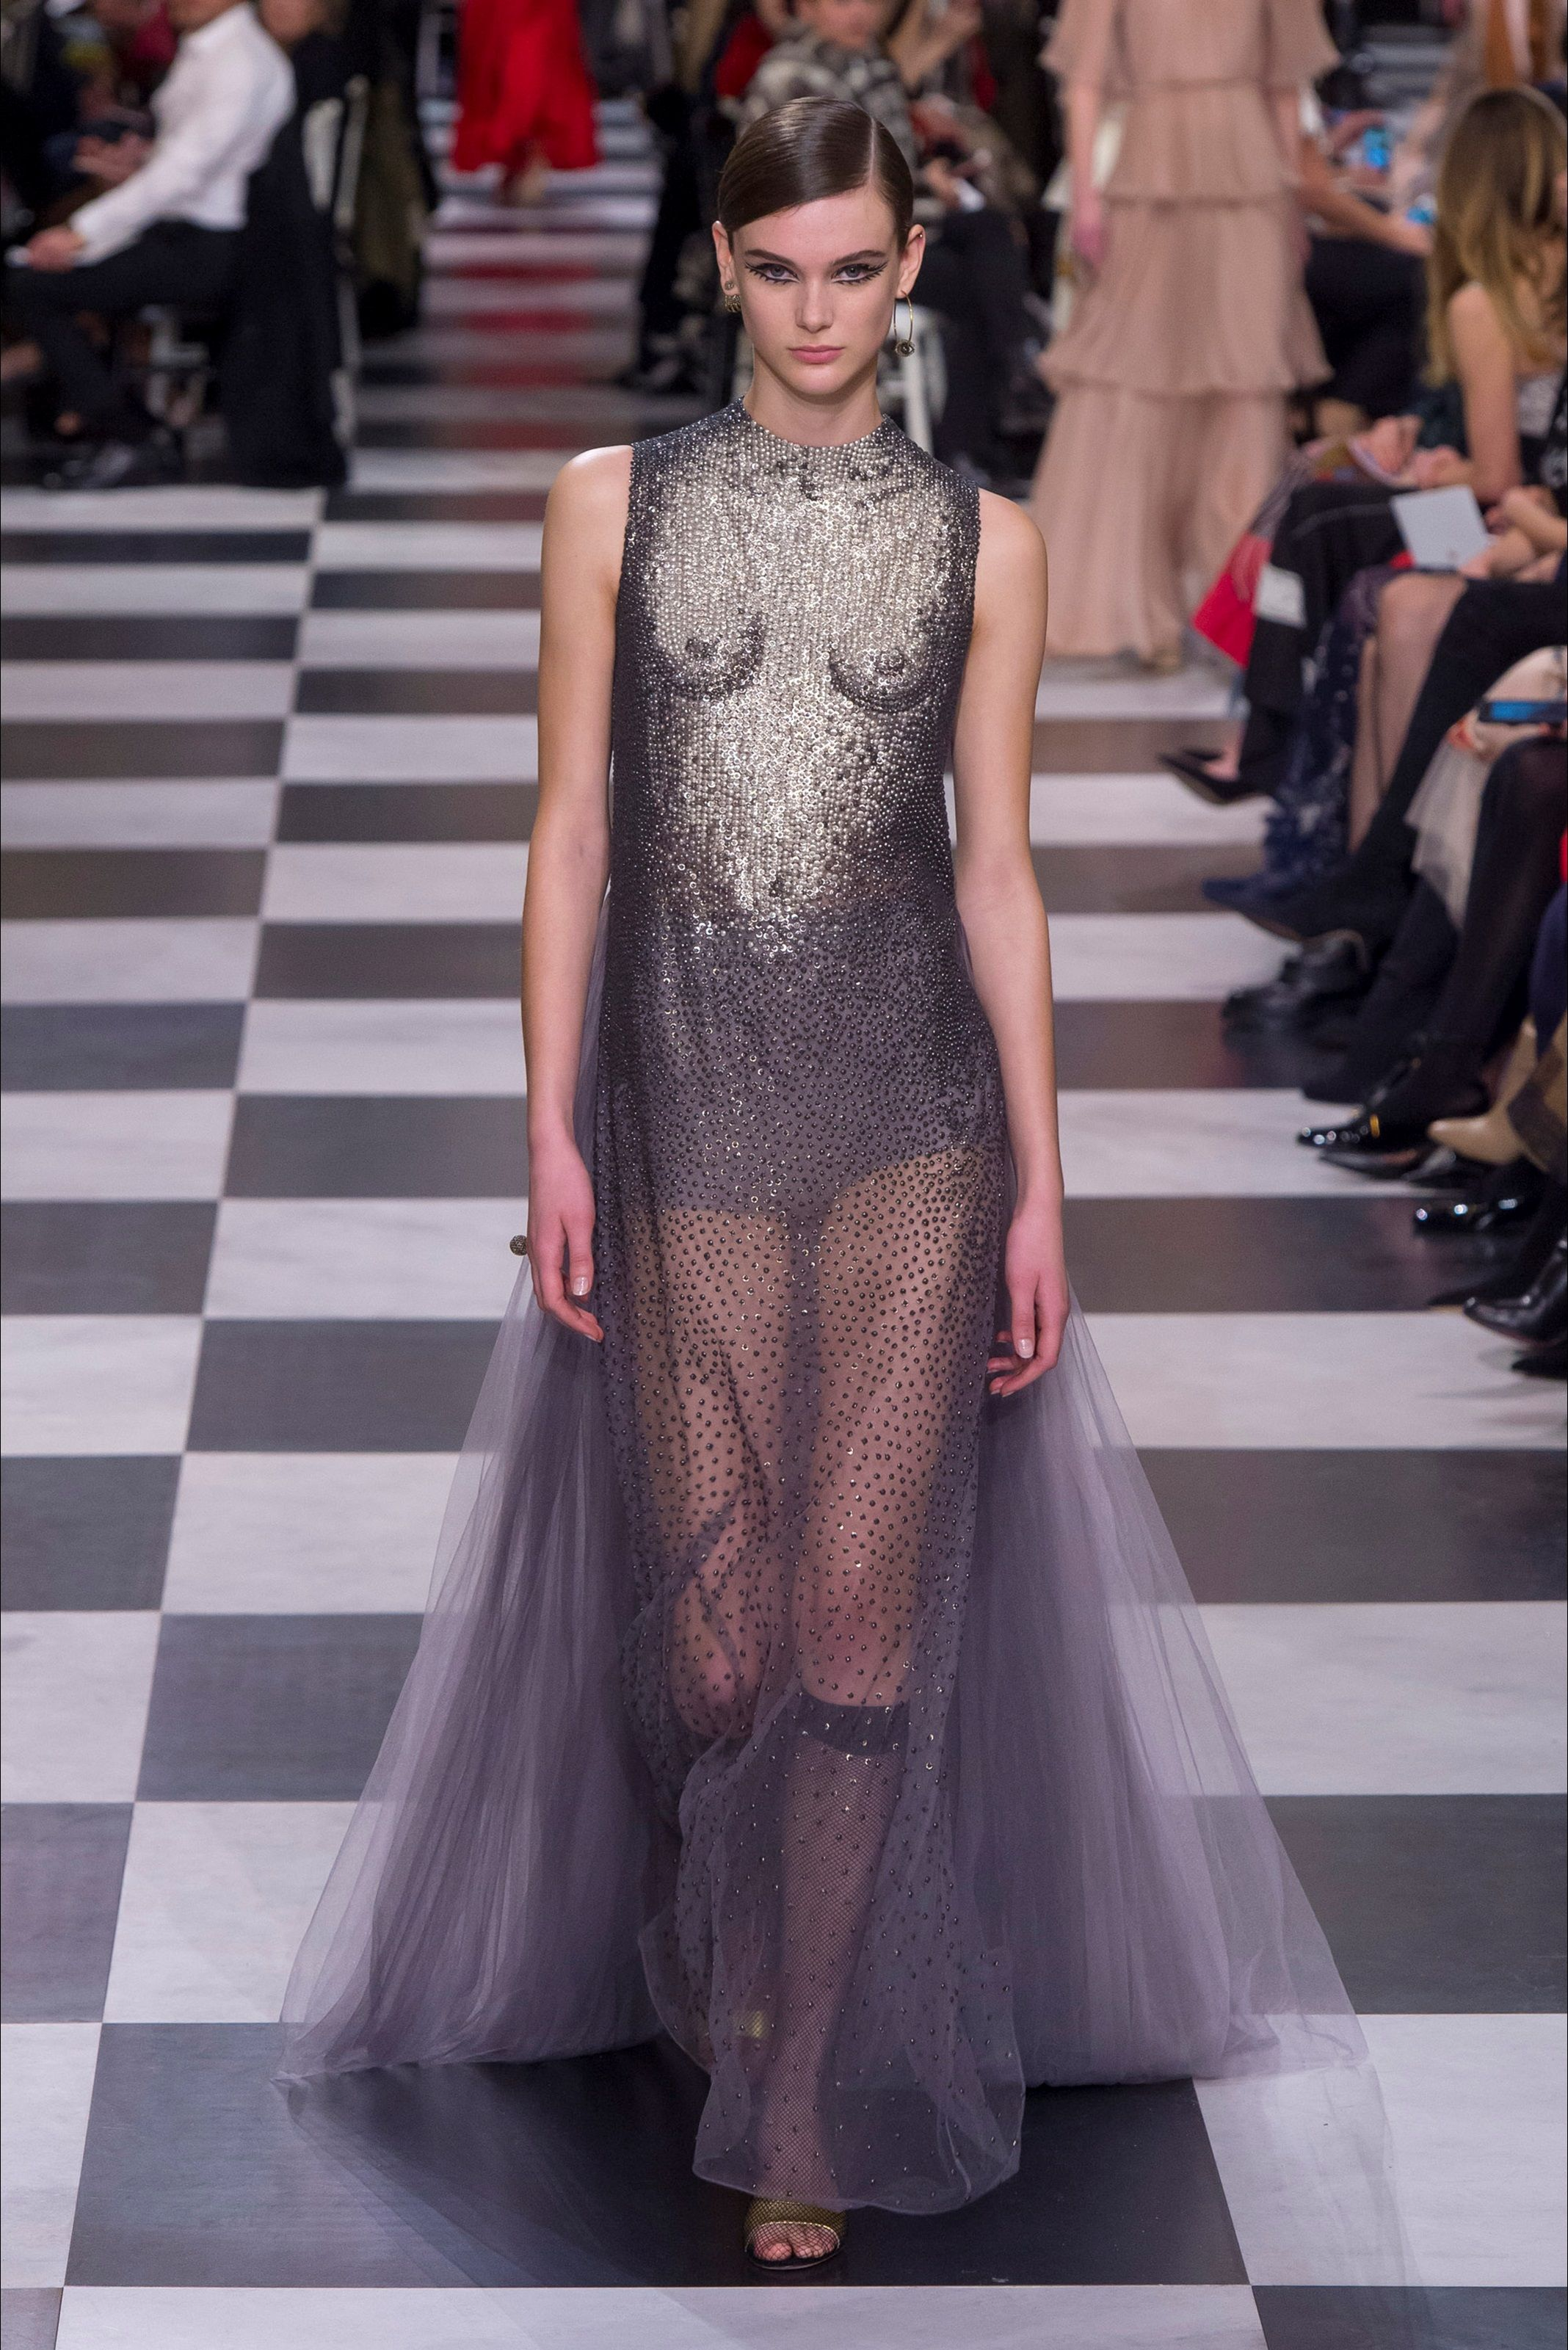 99da7b9f1b Sfilata Christian Dior Parigi - Alta Moda Primavera Estate 2018 ...